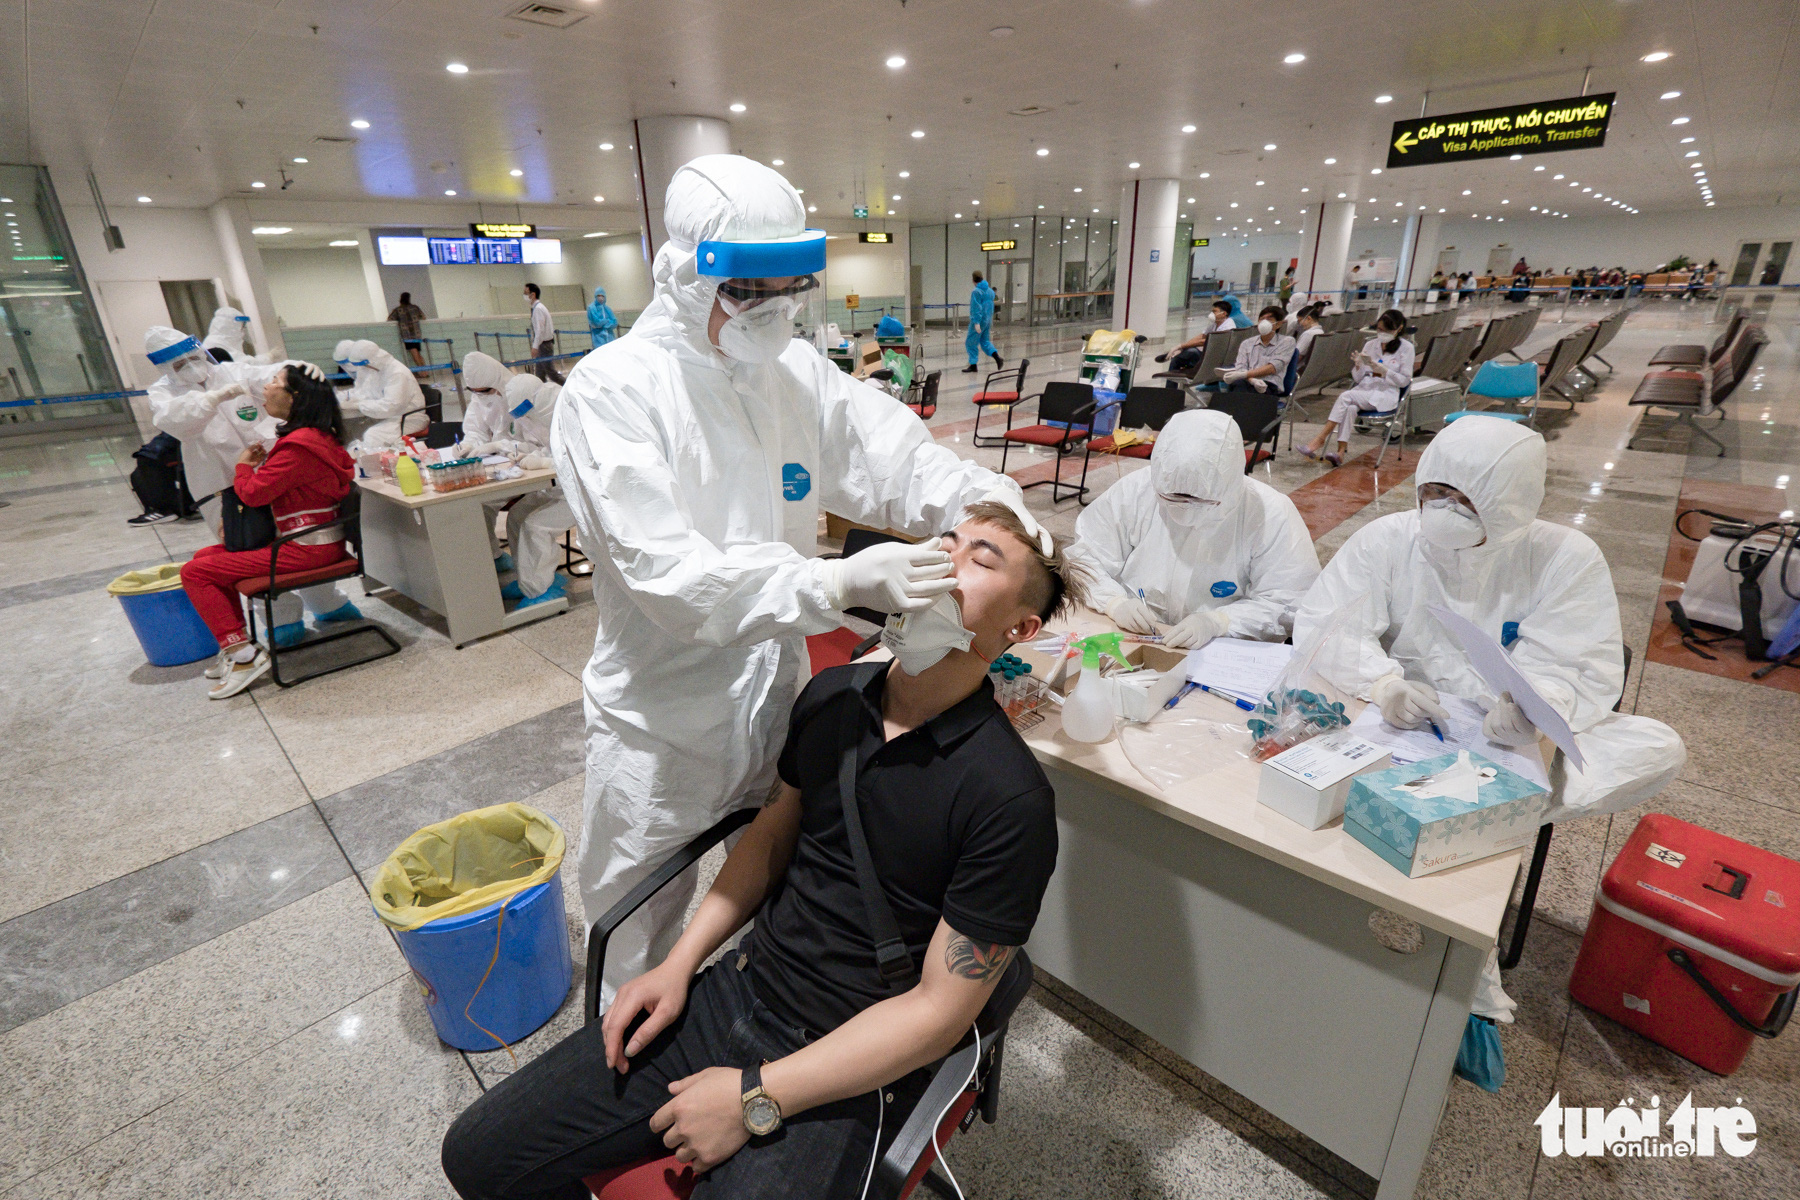 Health ministry scraps COVID-19 sampling at Hanoi airport over long waits